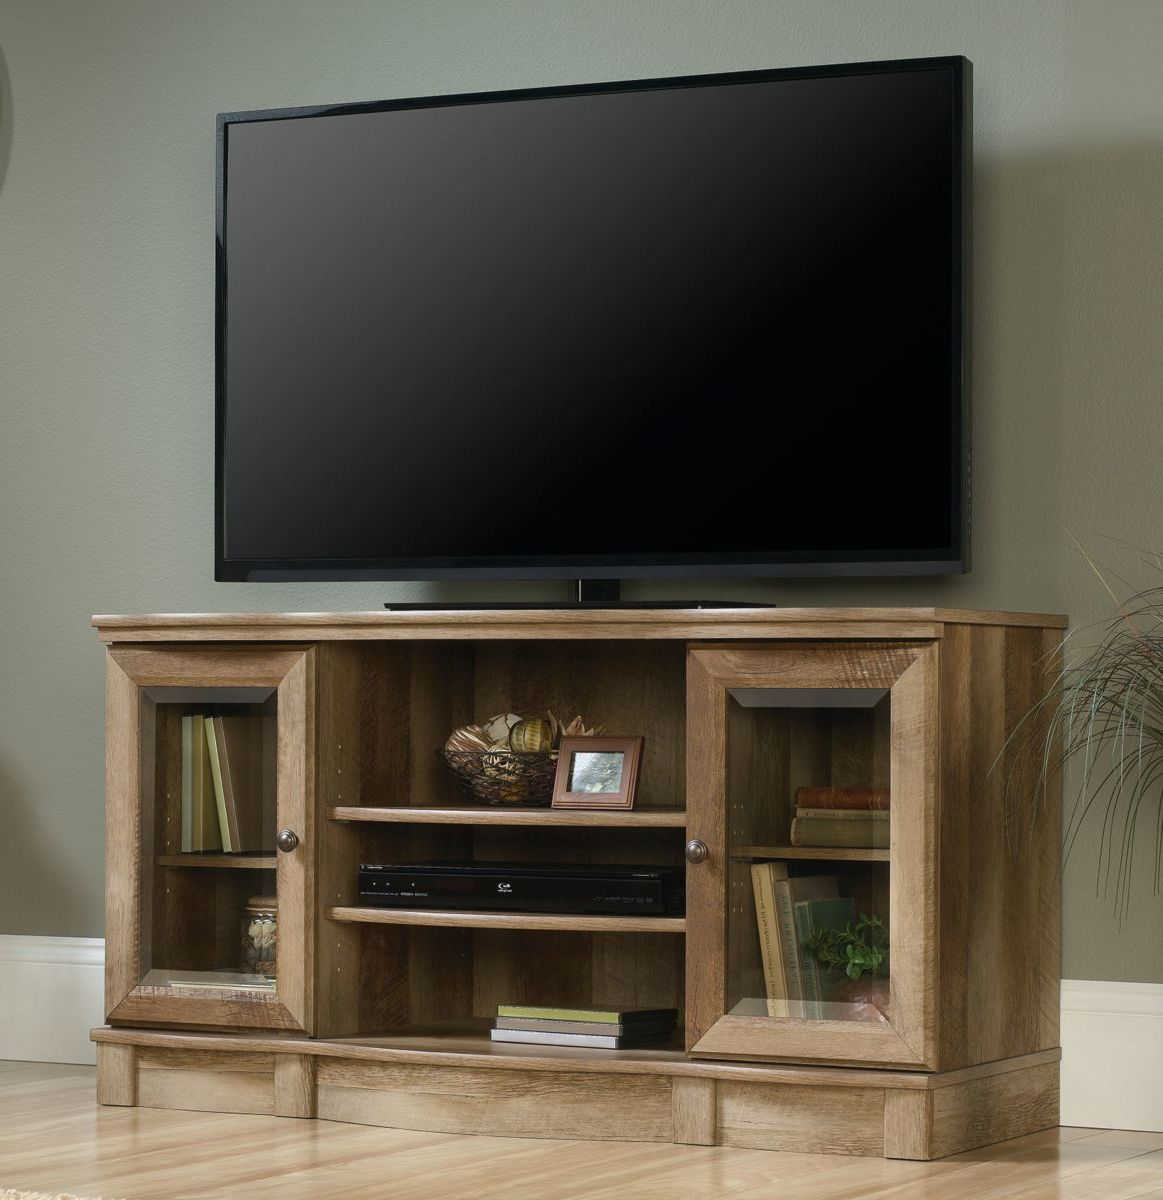 Sauder Woodworking Regent Place TV Stand